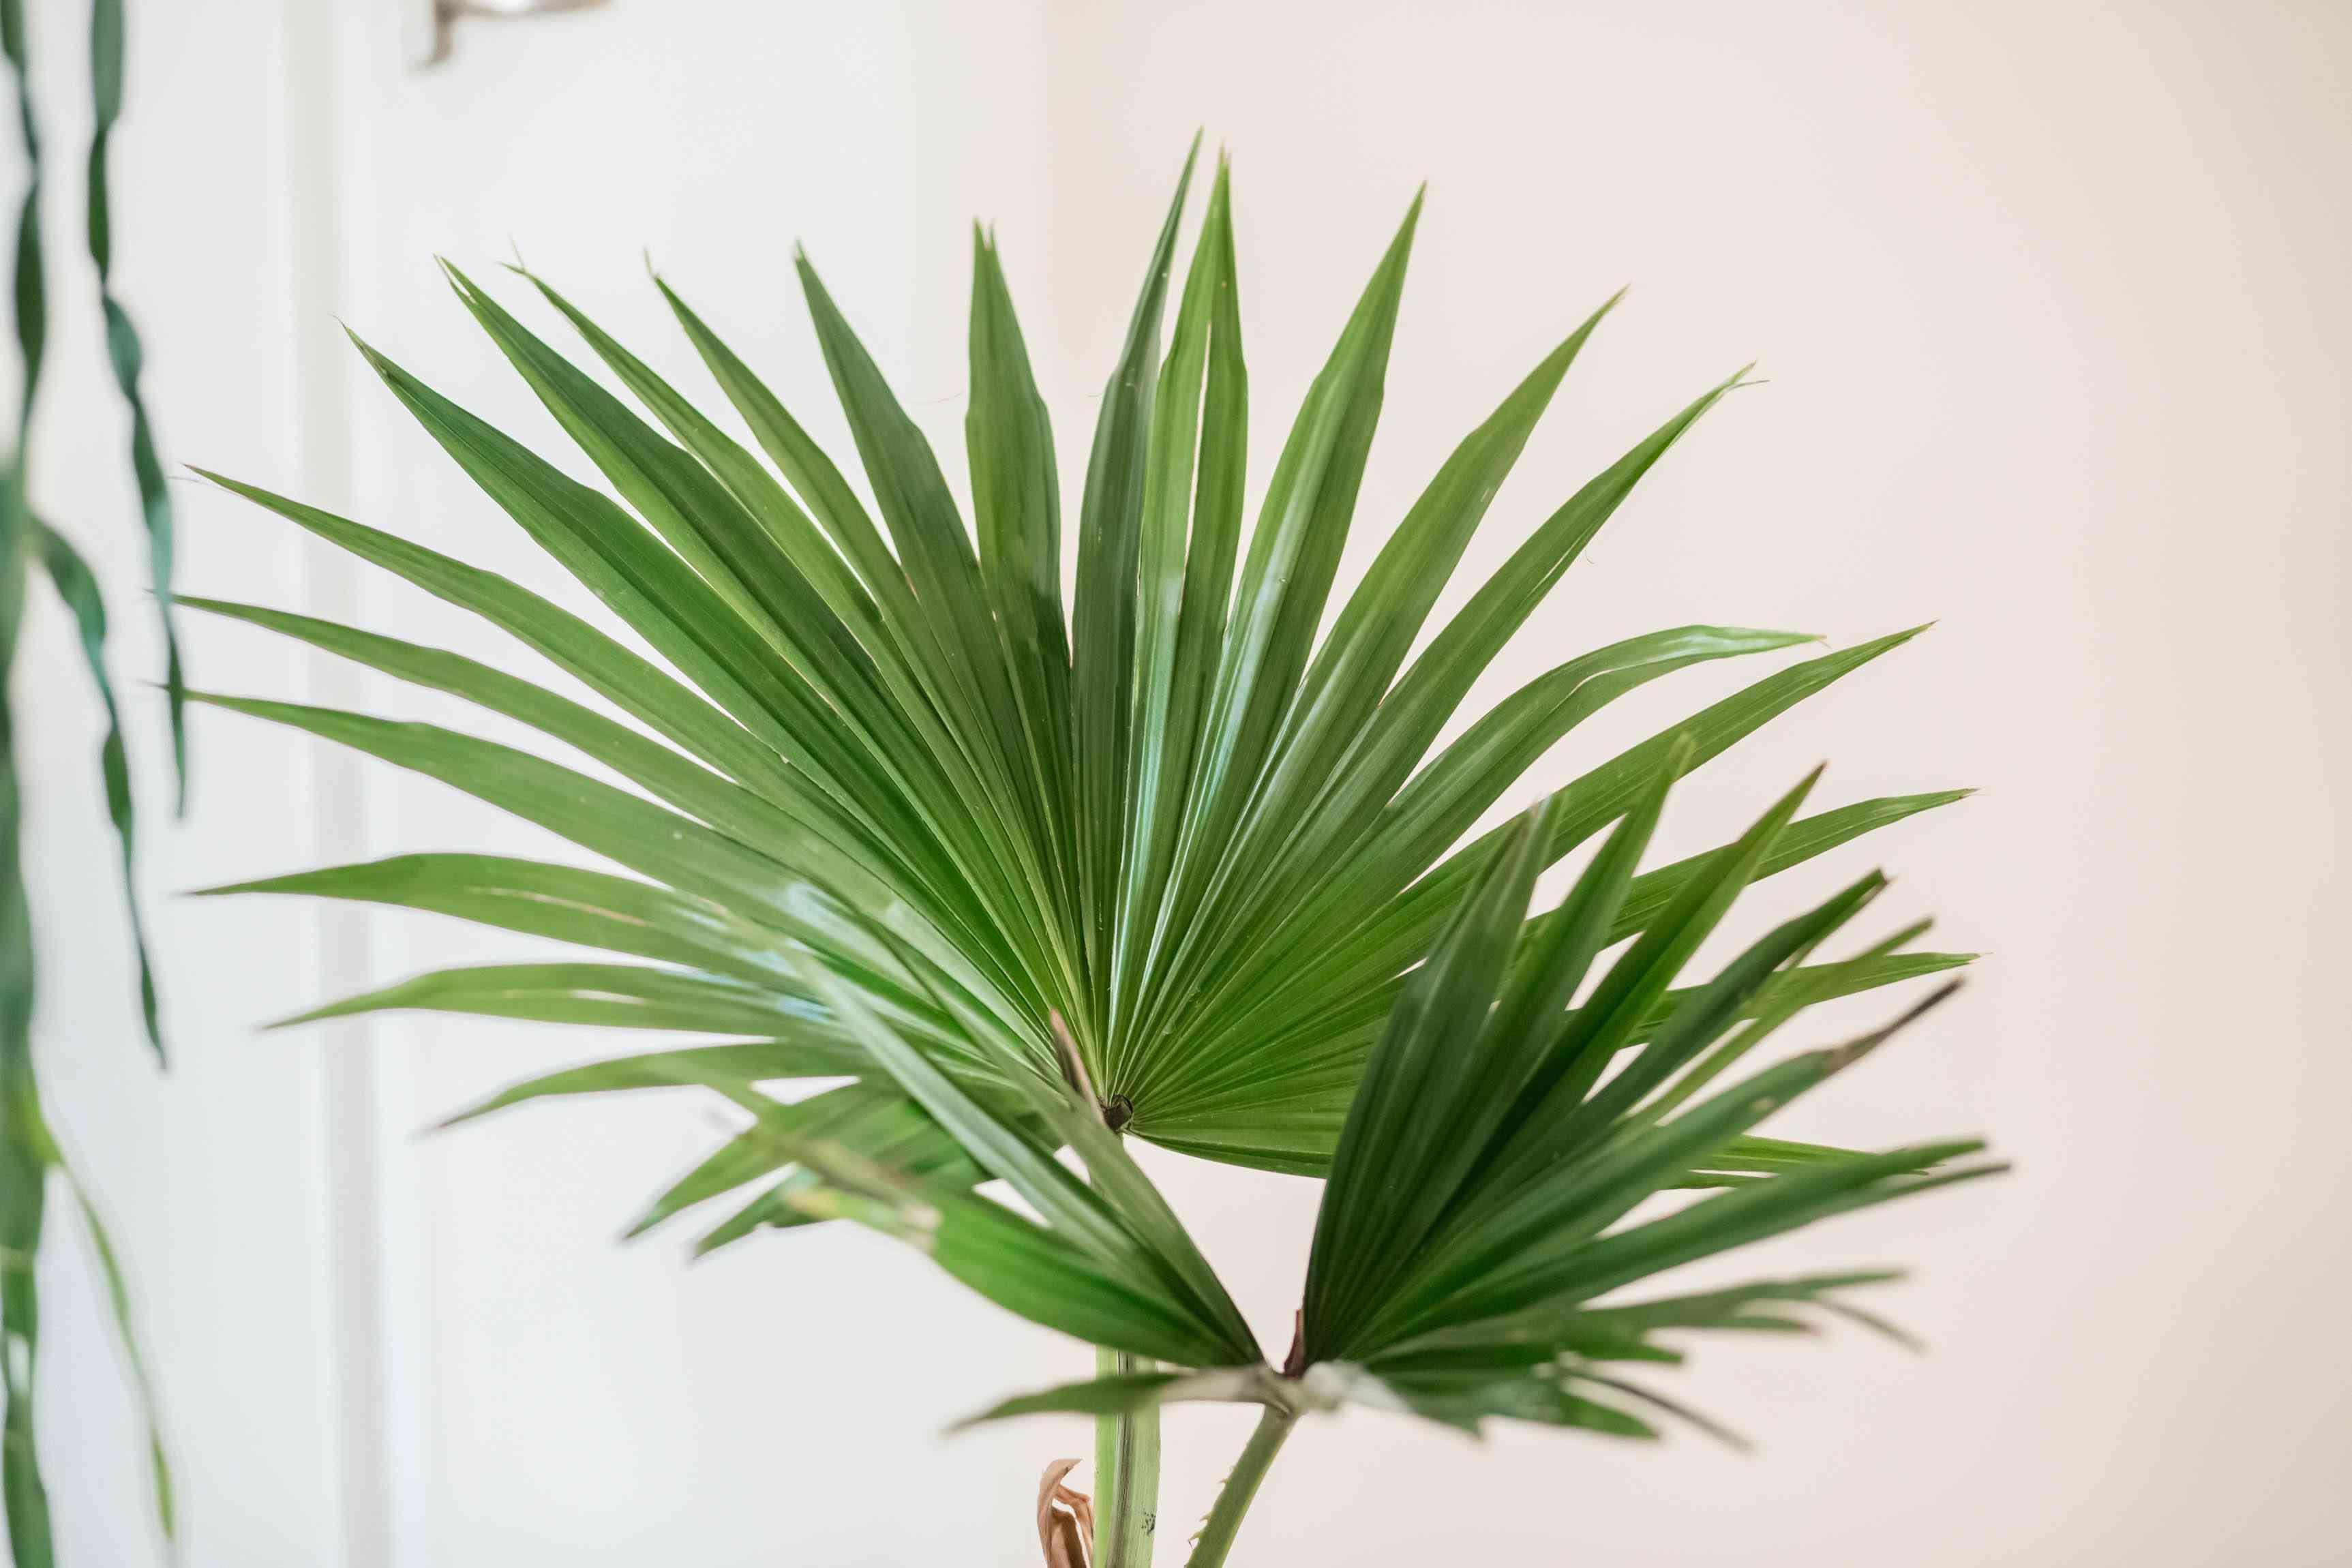 Chinese fan palm detail